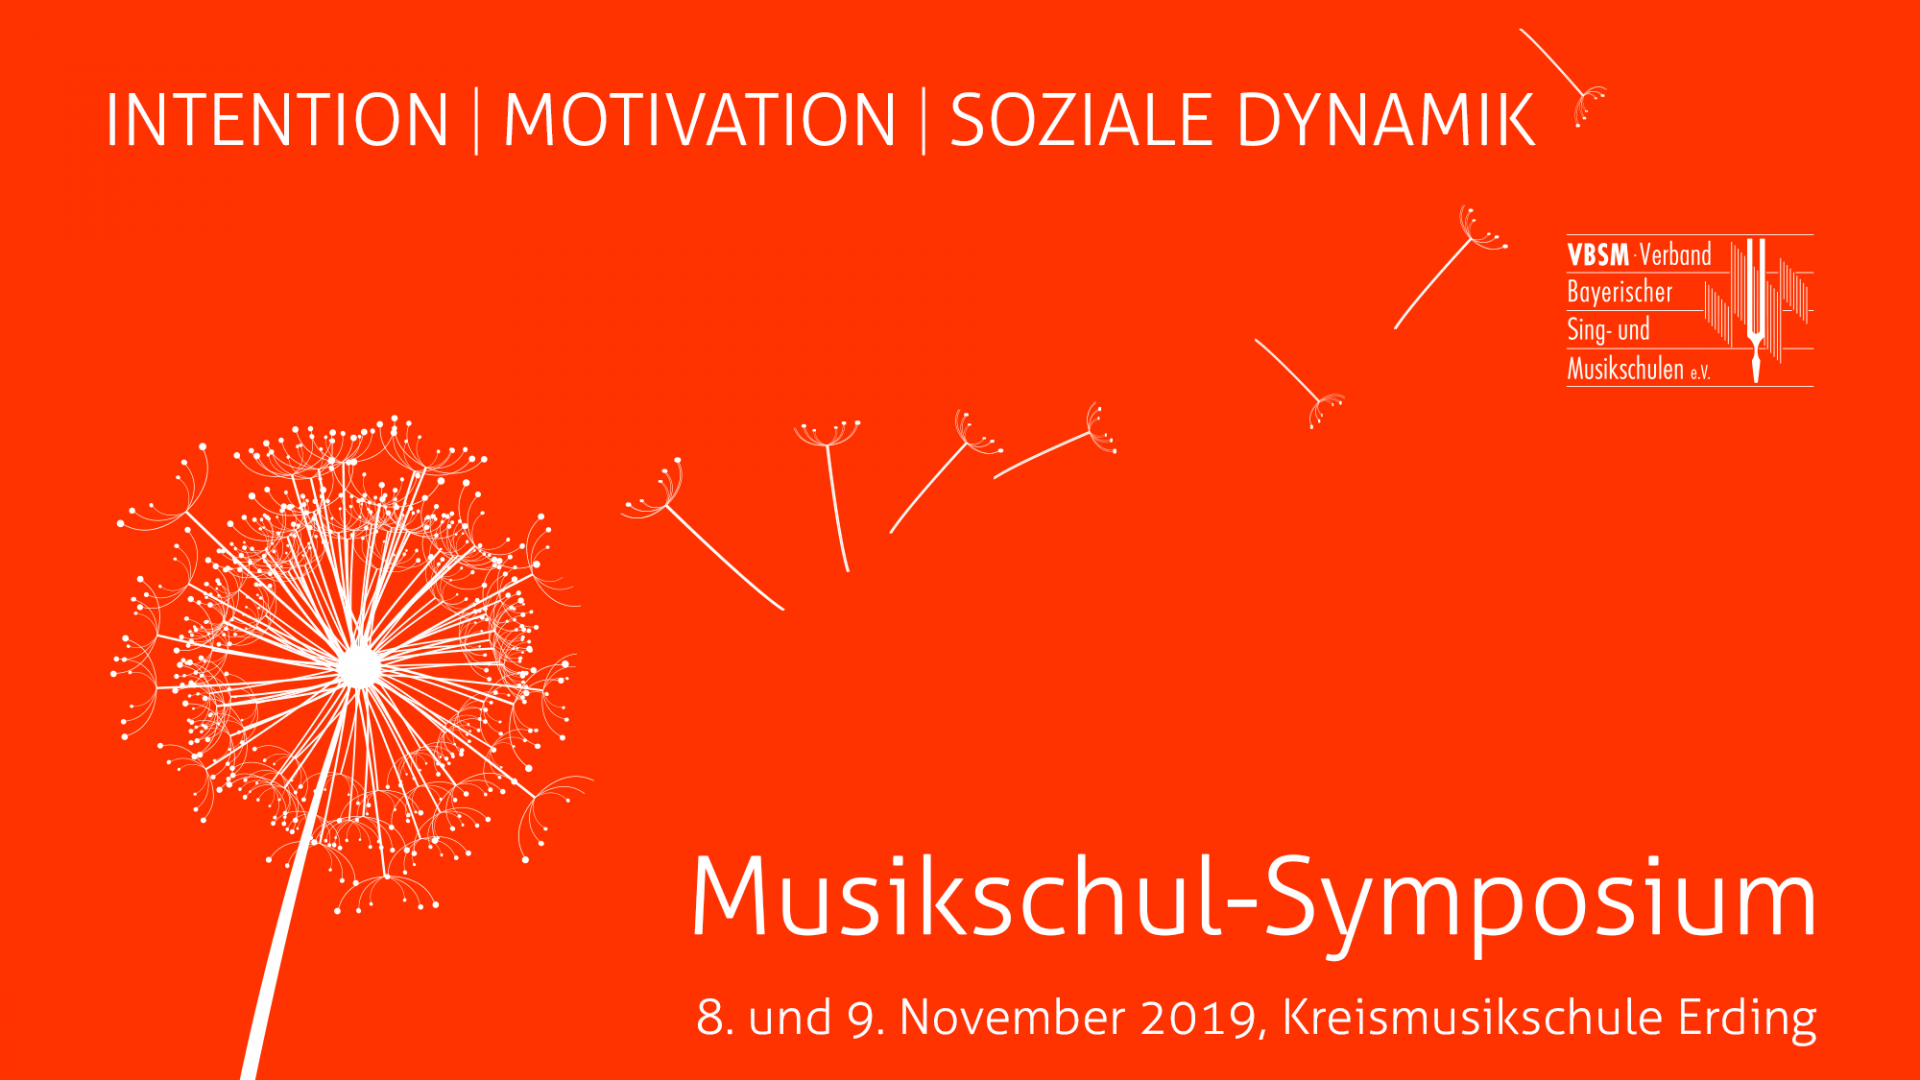 Musikschul-Symposium